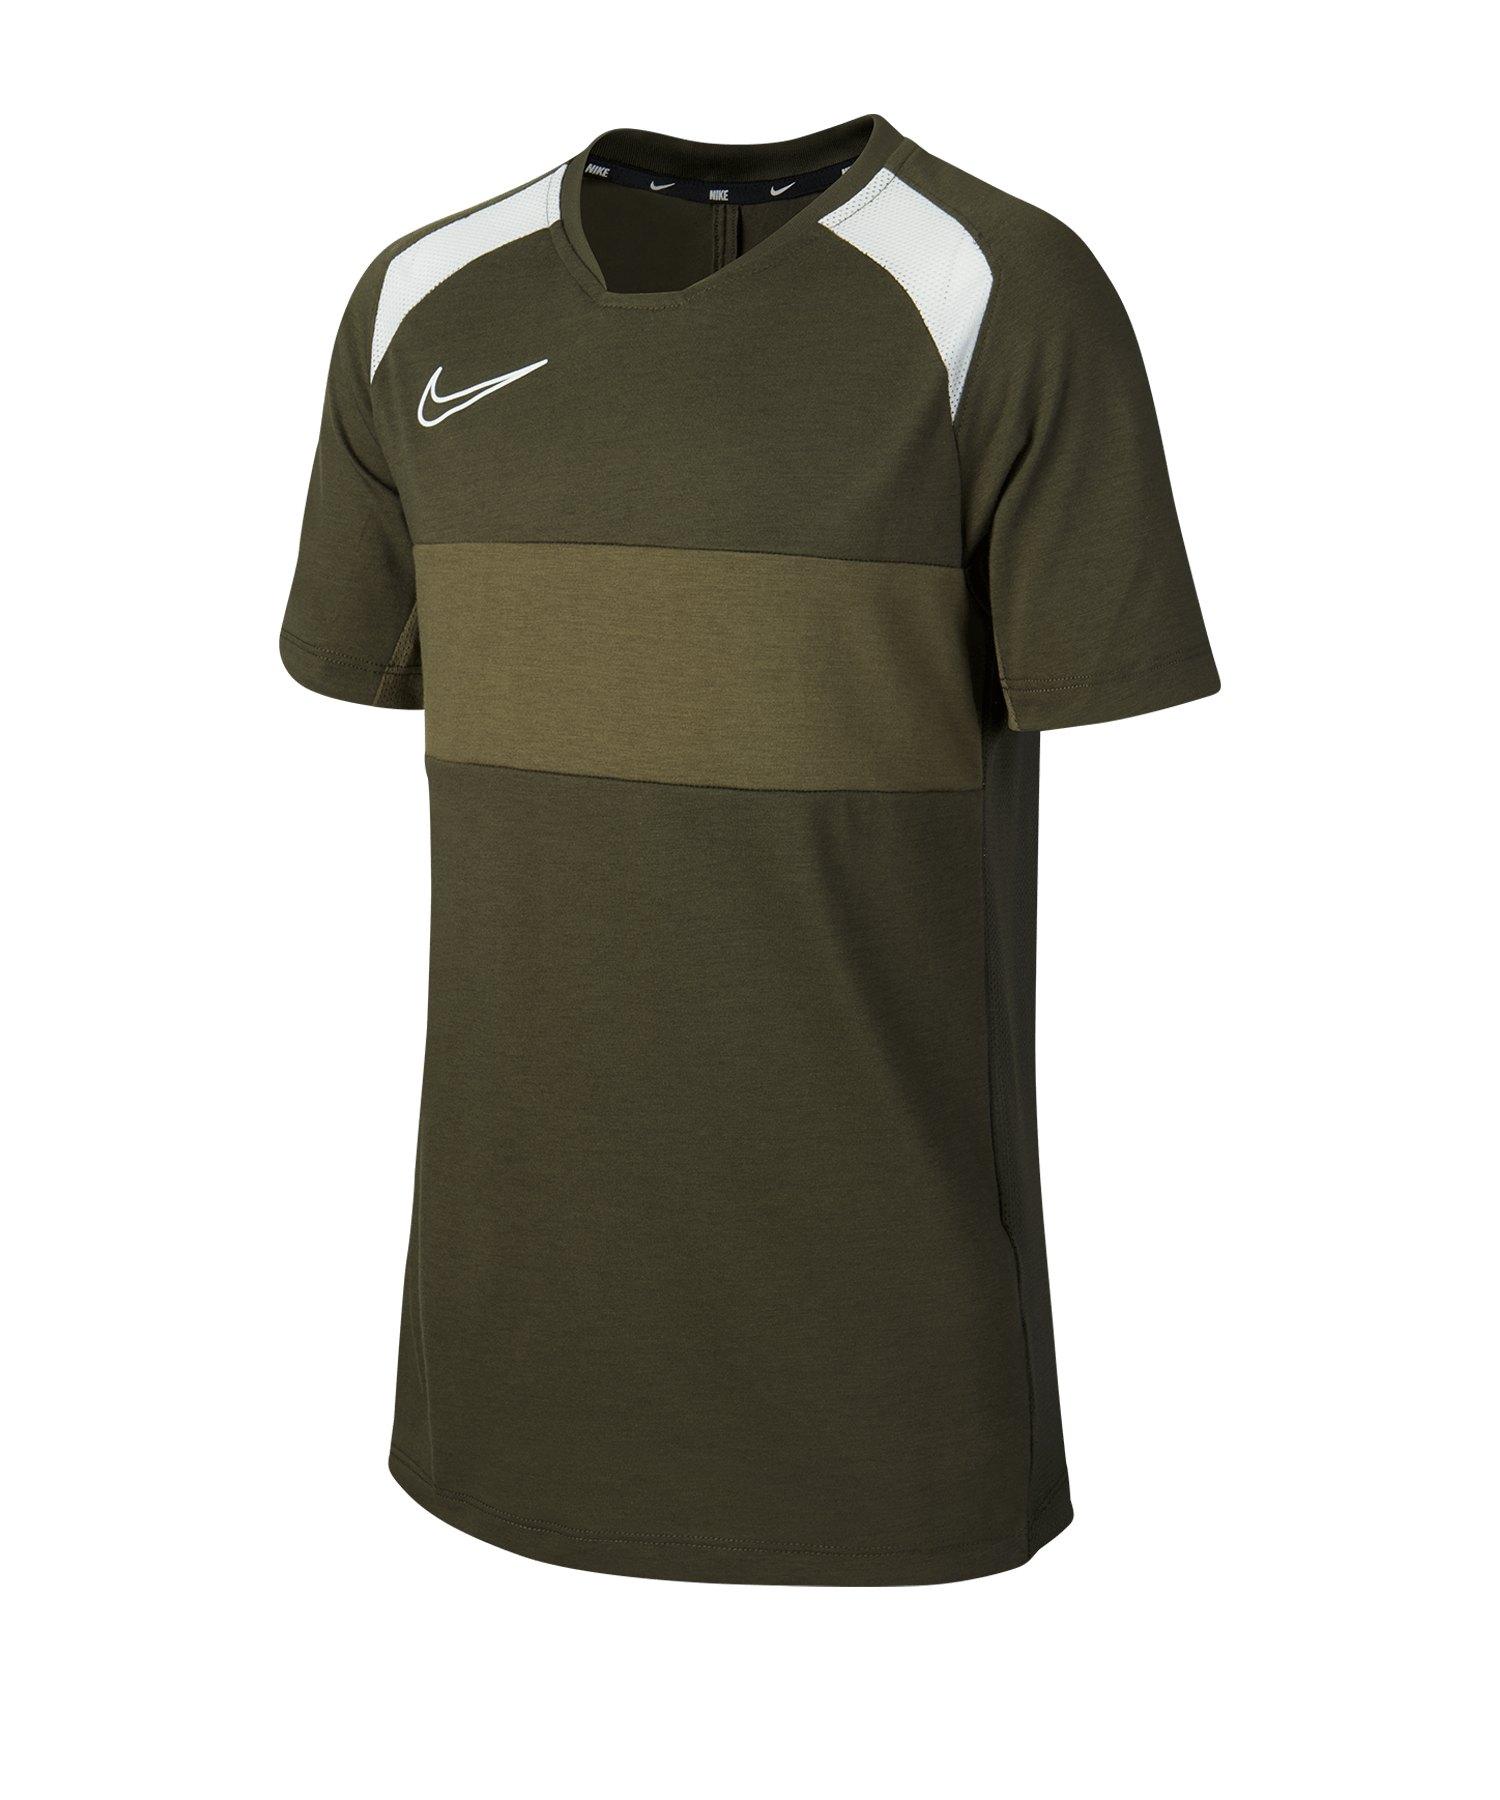 Nike Academy Trainingstop kurzarm Kids F325 - gruen